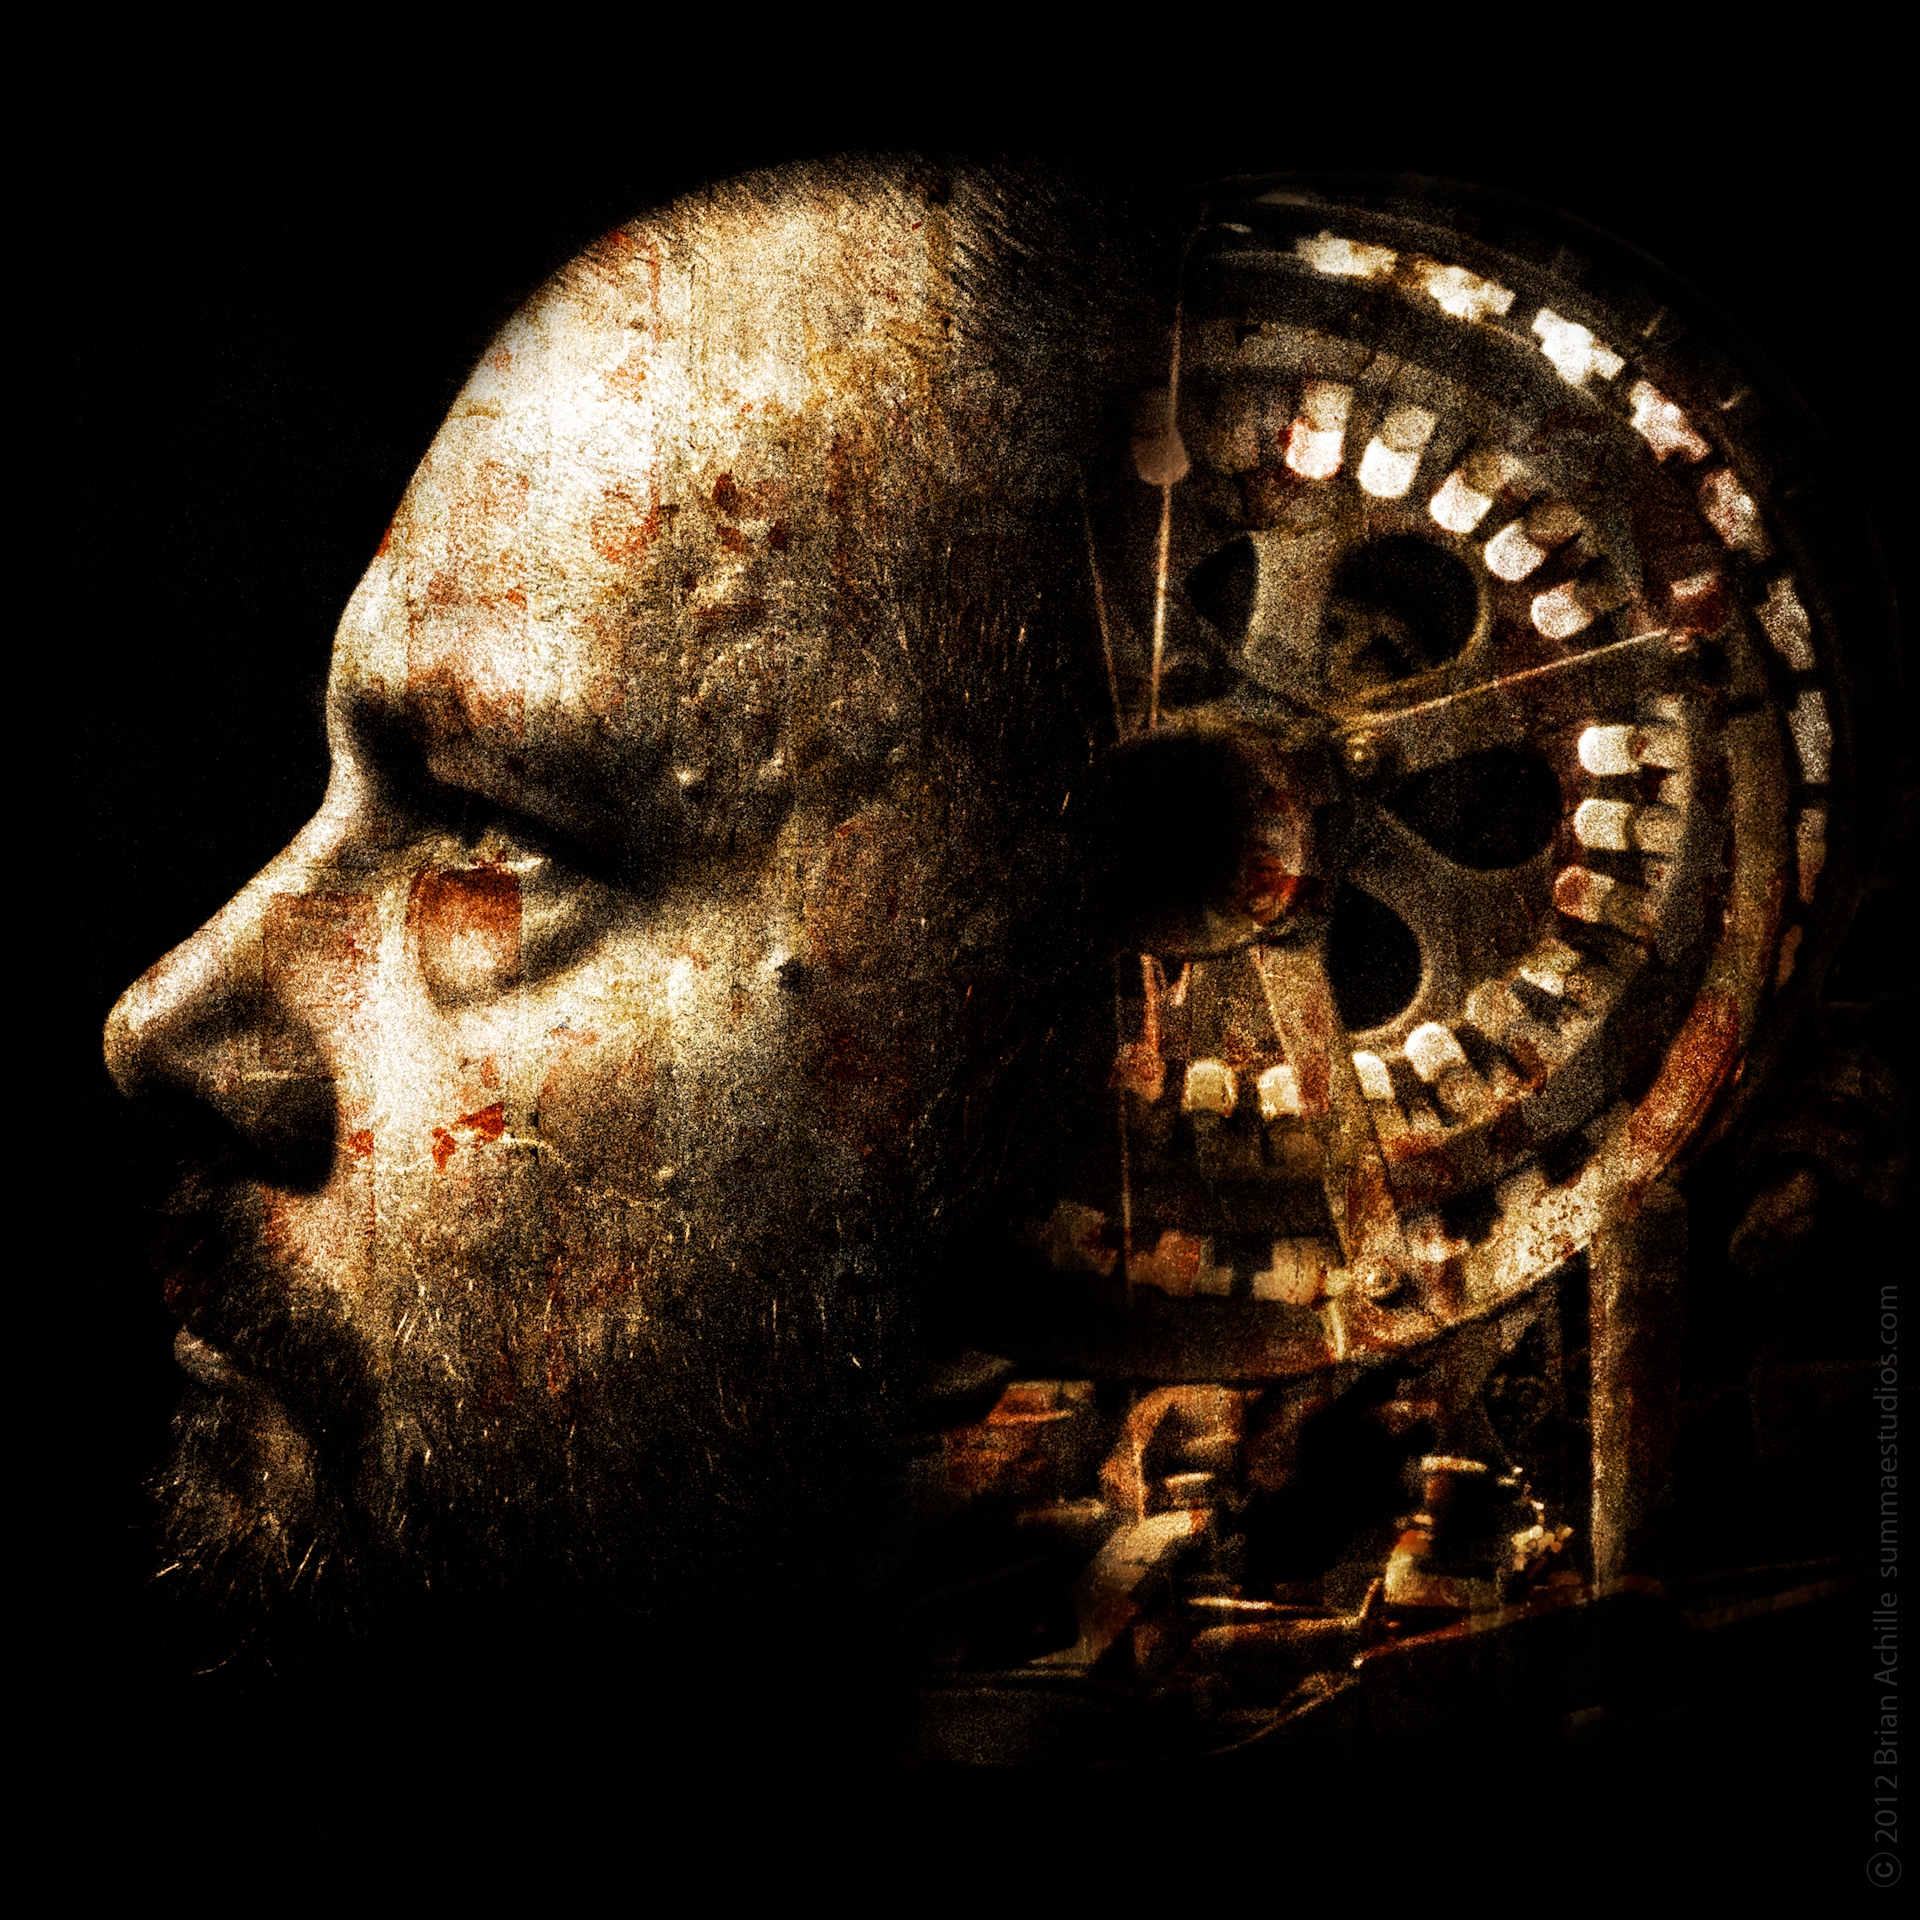 mind feels antiquated machine - #digitalart - brian_of_summaestudios | ello